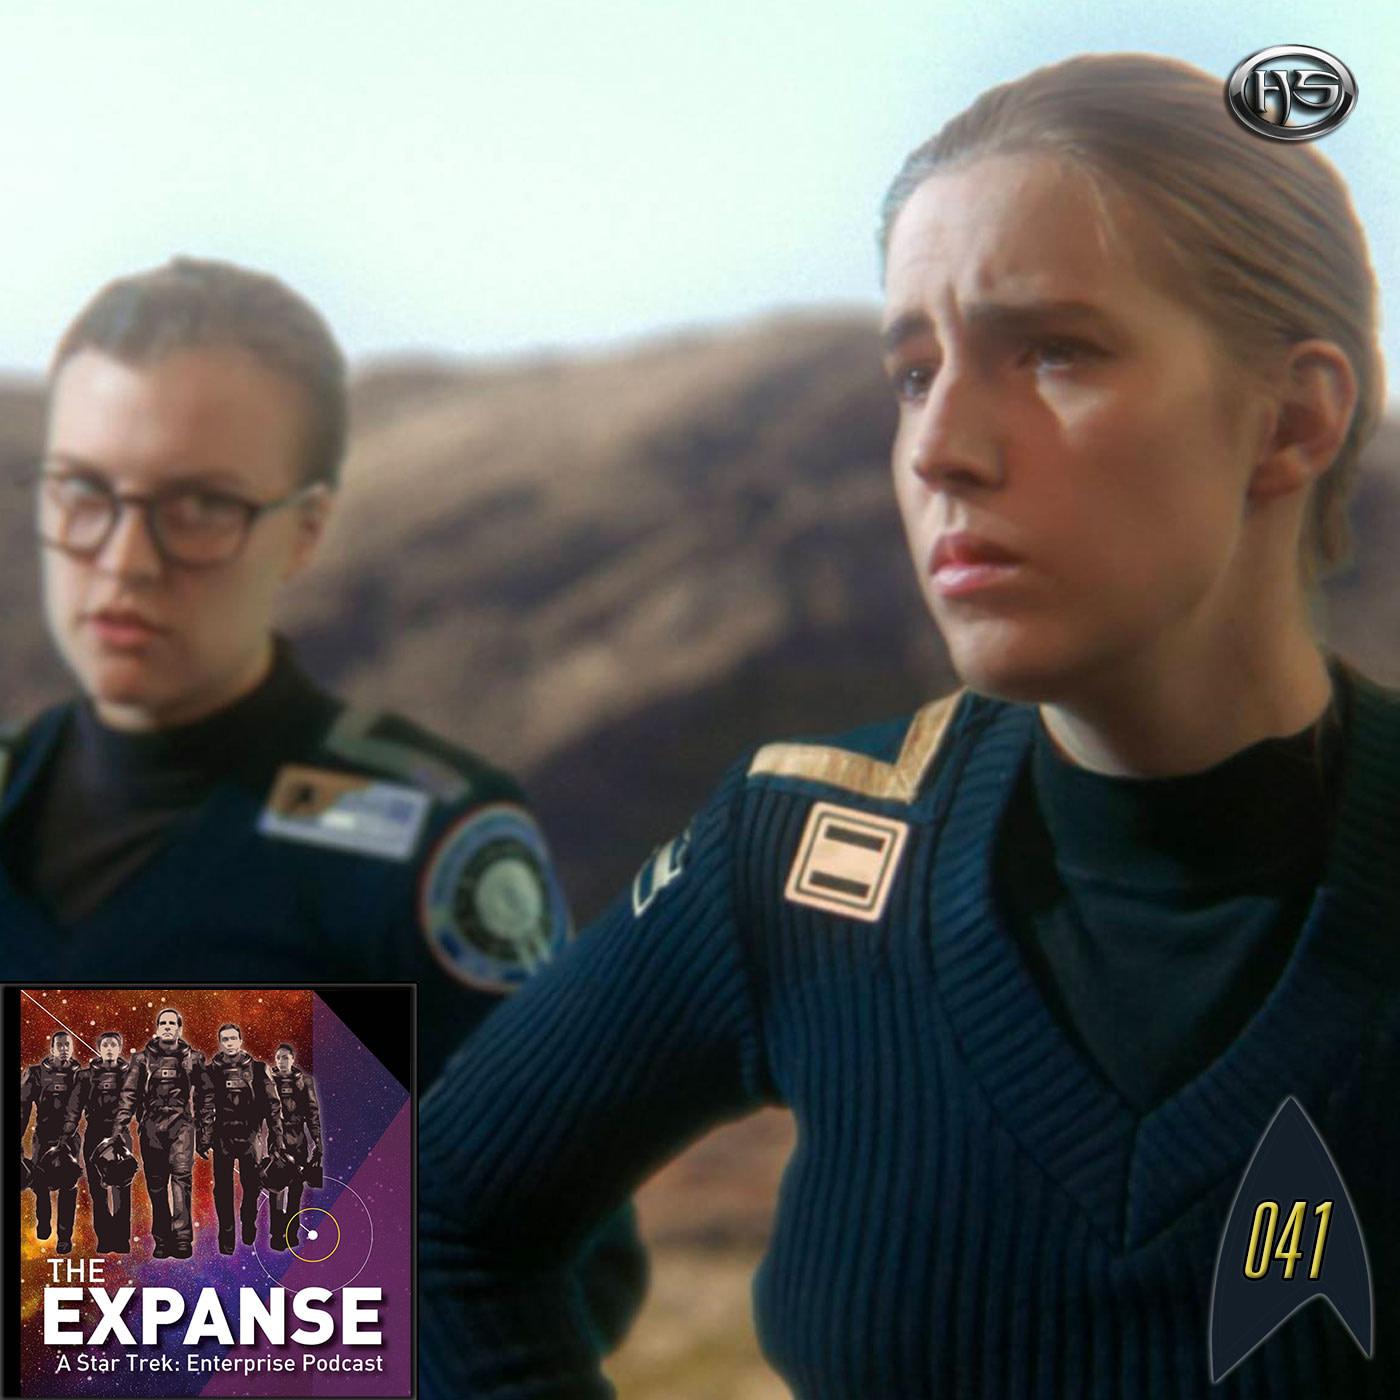 The Expanse Episode 41